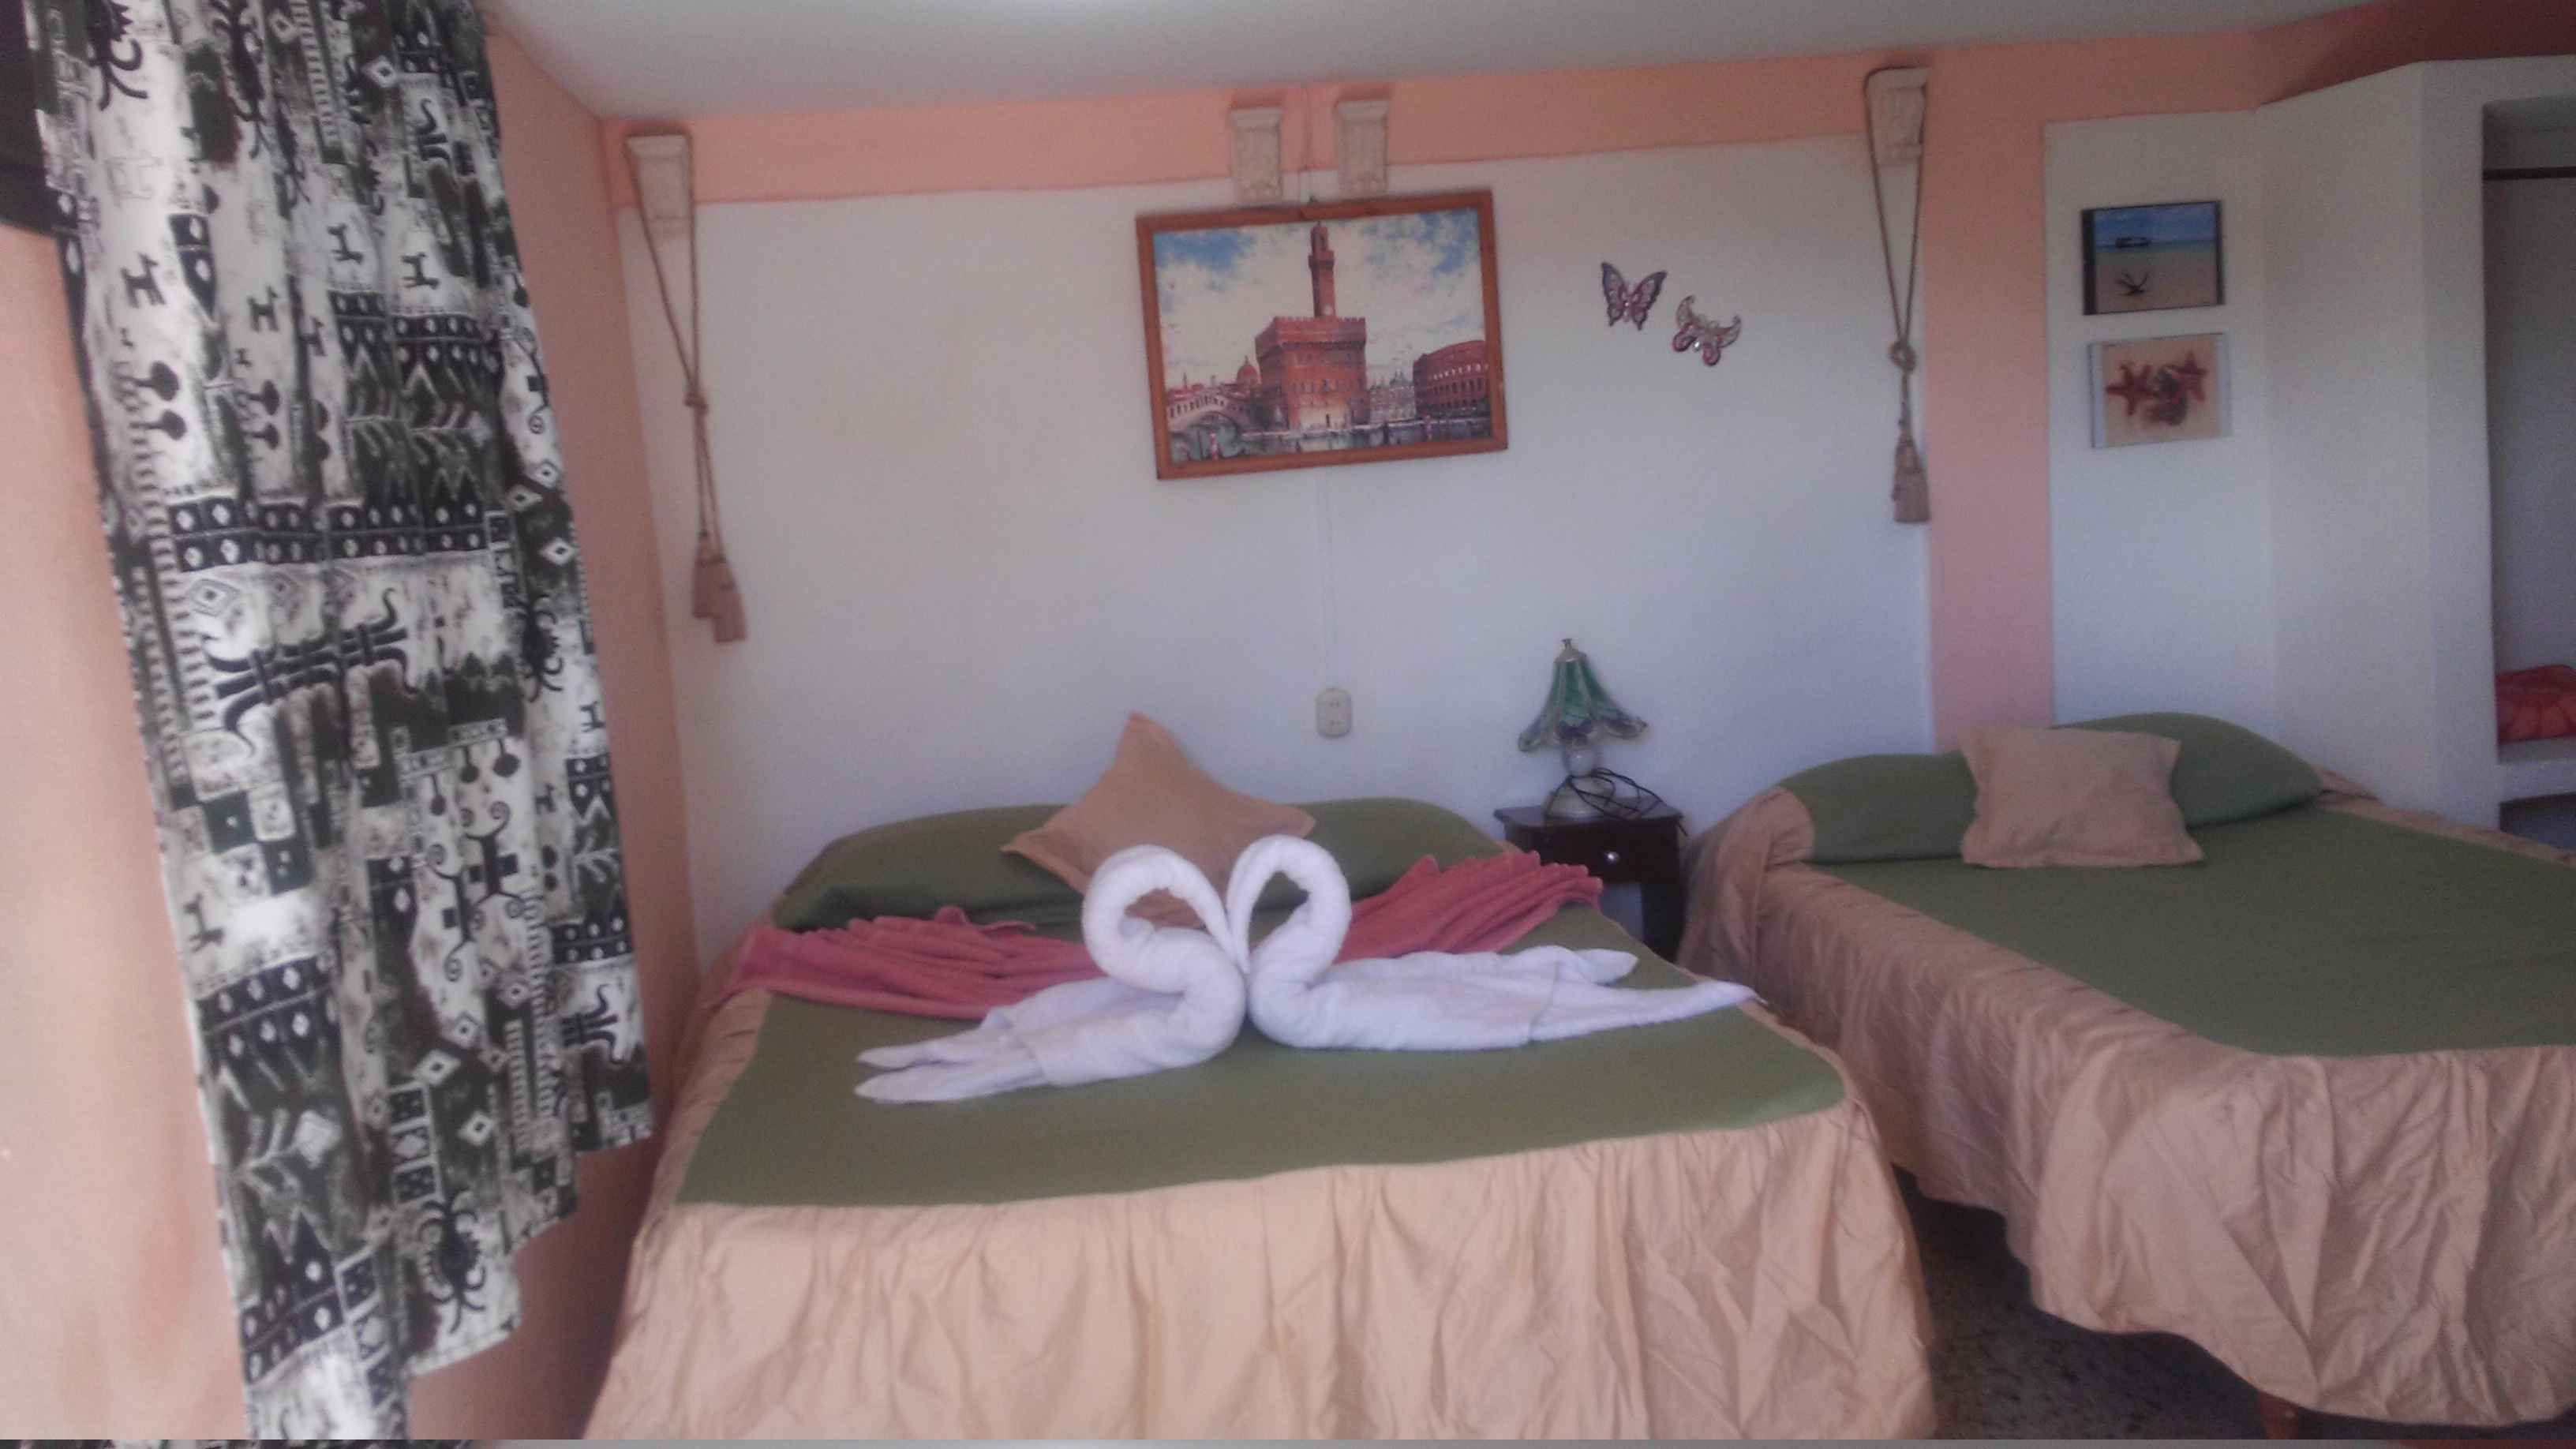 VAR021 – Room 2 Quadruple room with private bathroom